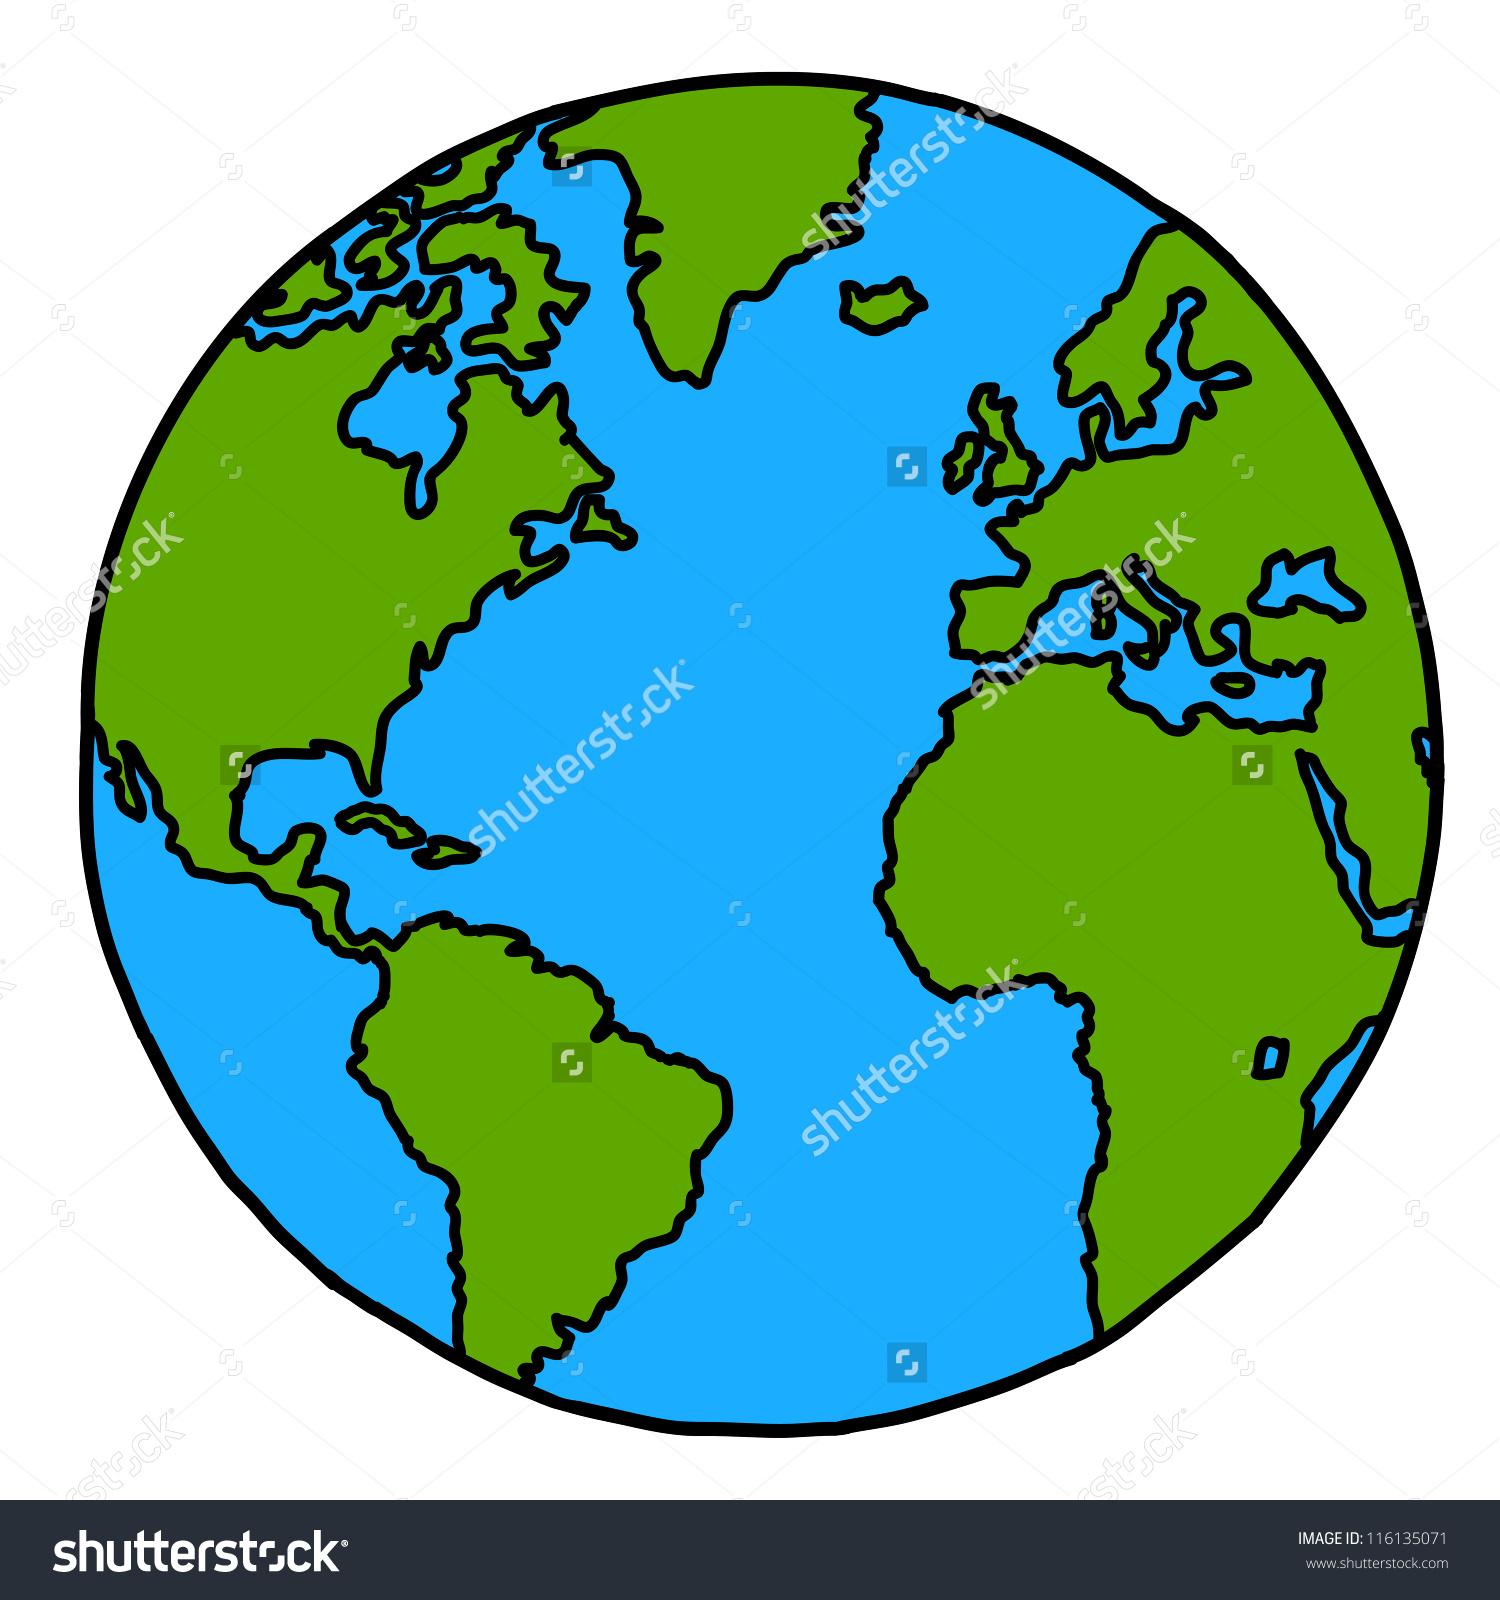 1500x1600 Cartoon World Drawing Planet Earth Hand Writing Cartoon Credit